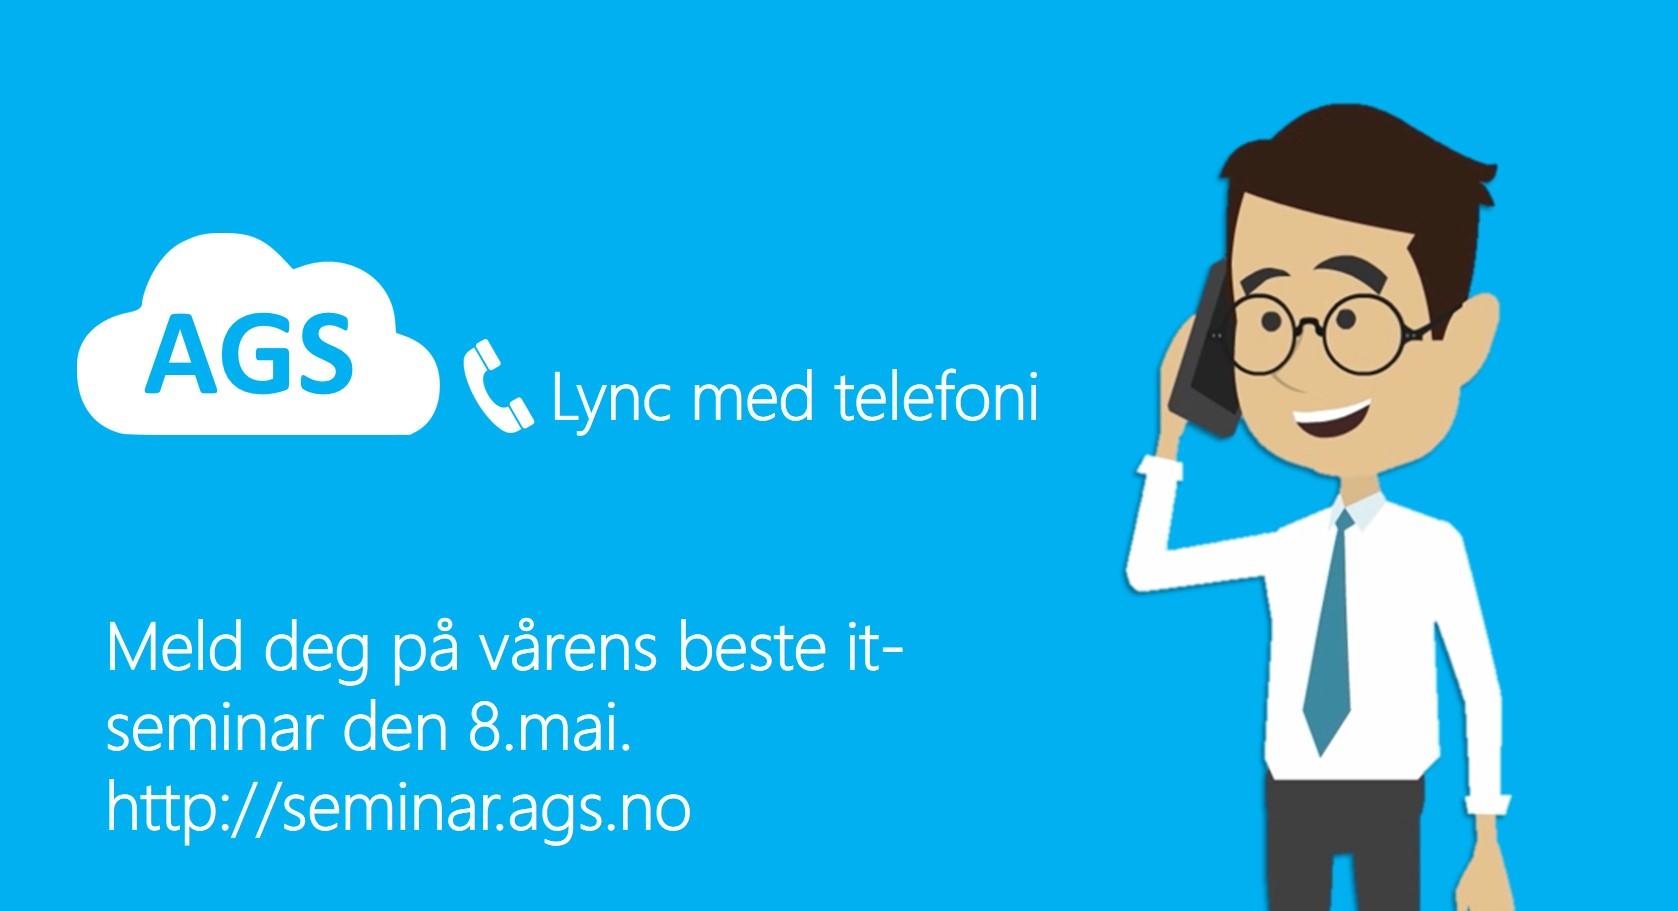 Opplev Lync med telefoni